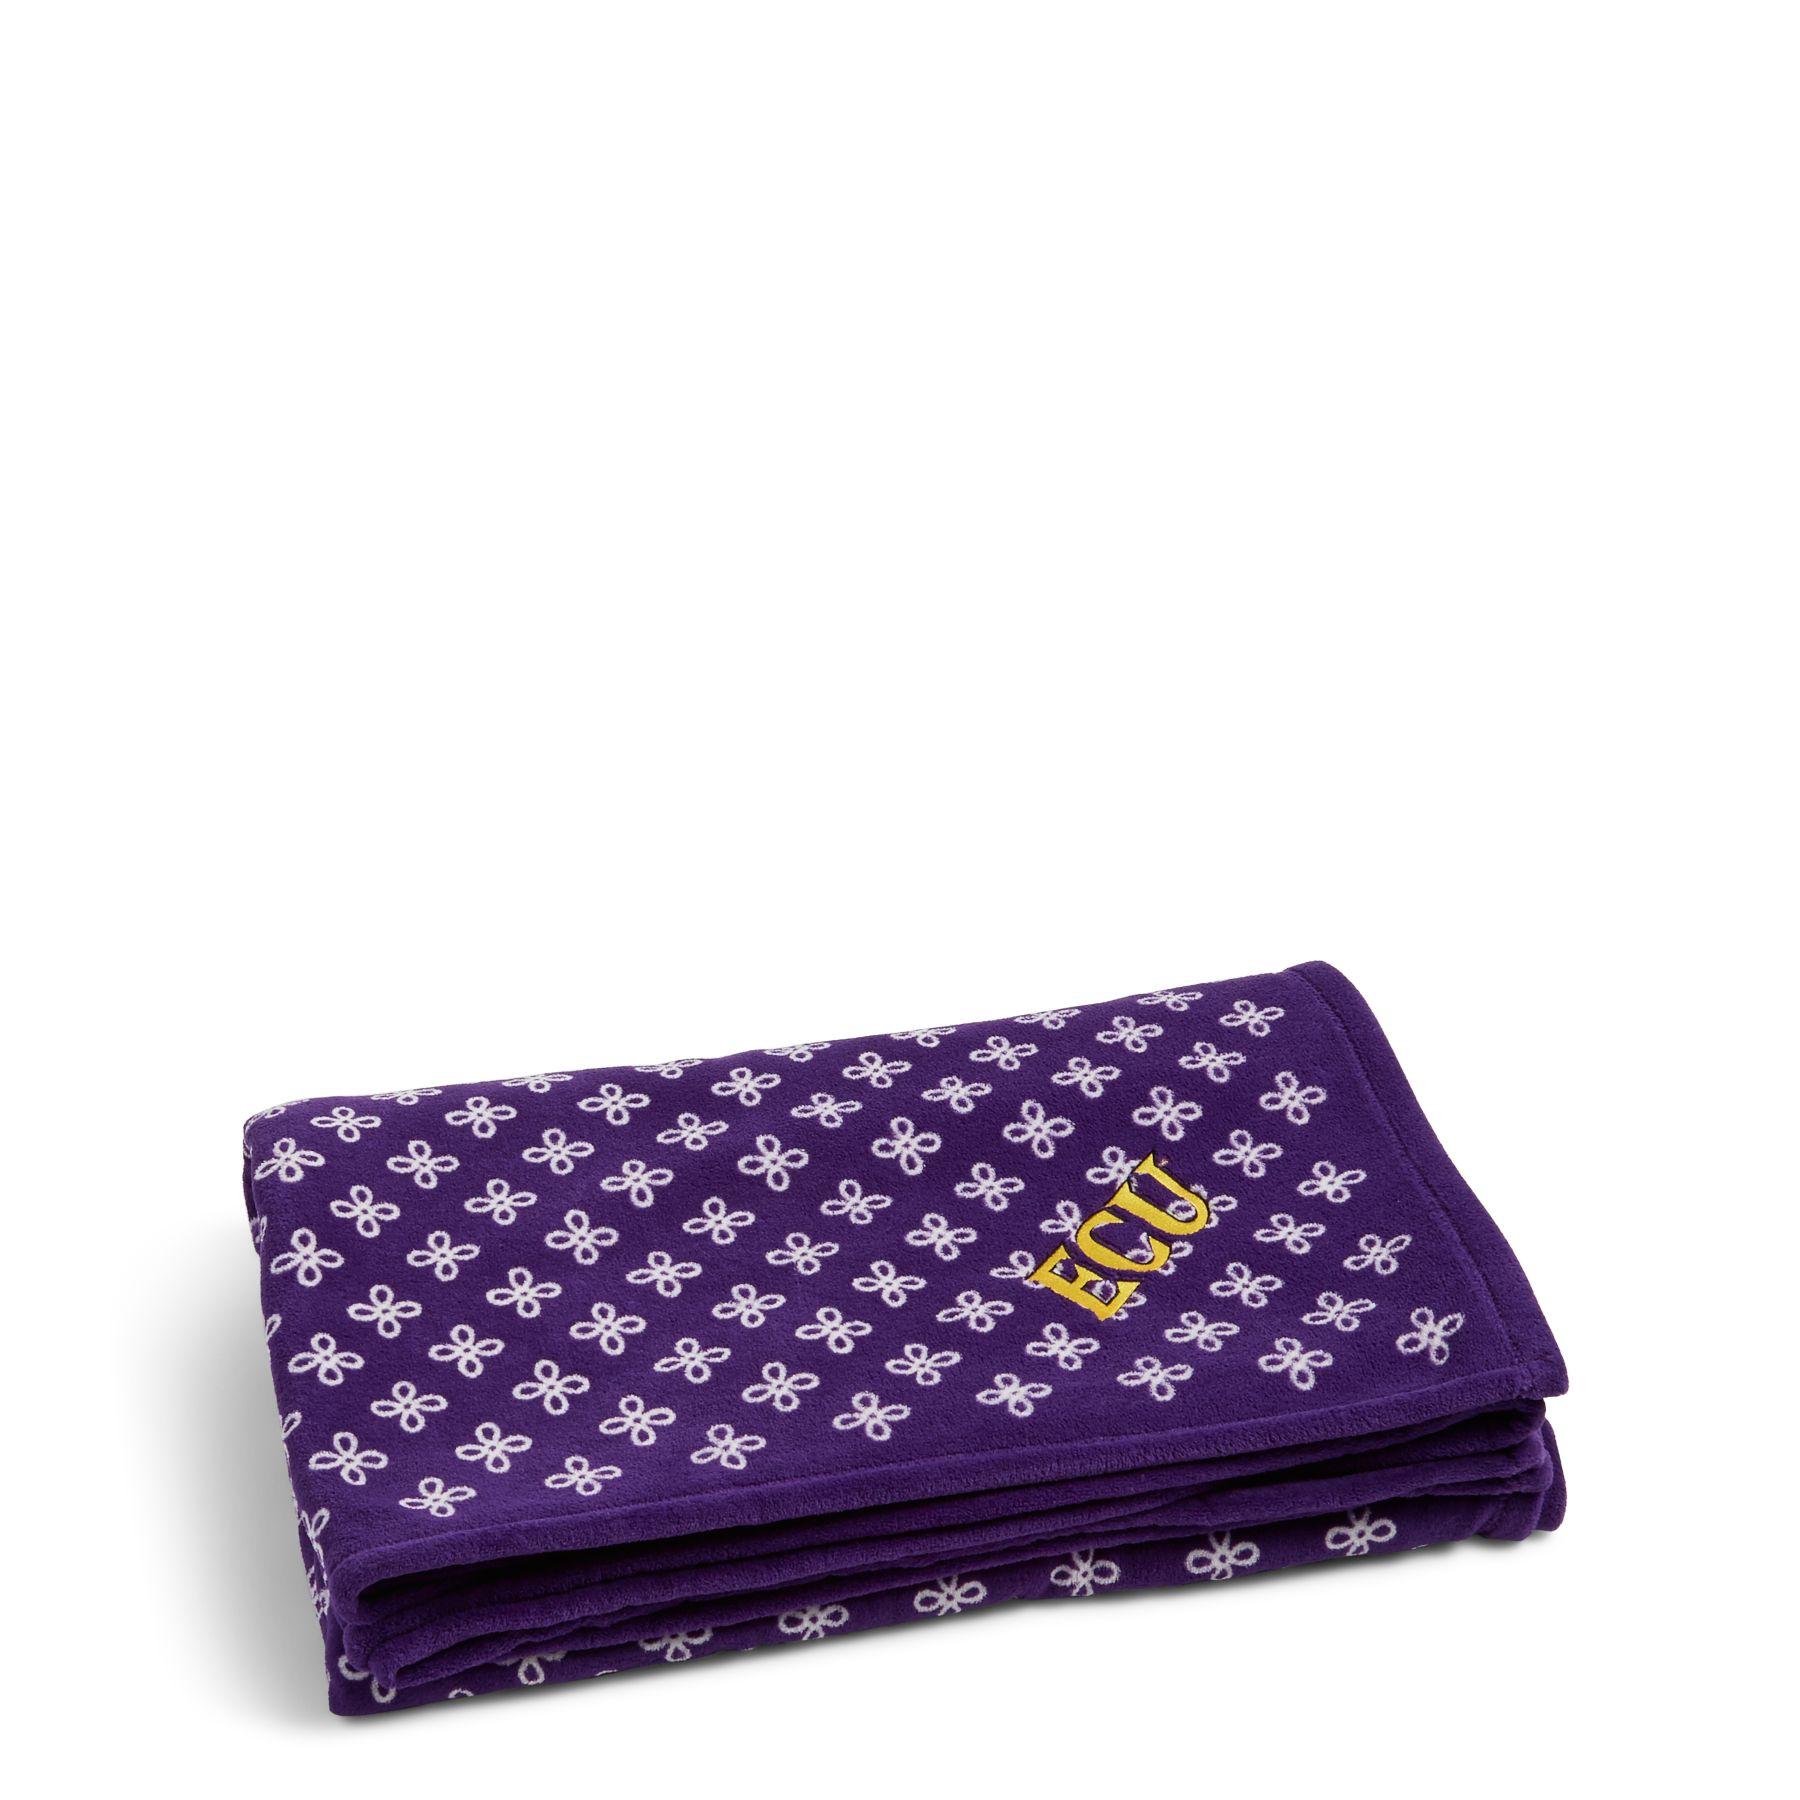 Vera Bradley Xl Throw Blanket In Purple White Mini 88